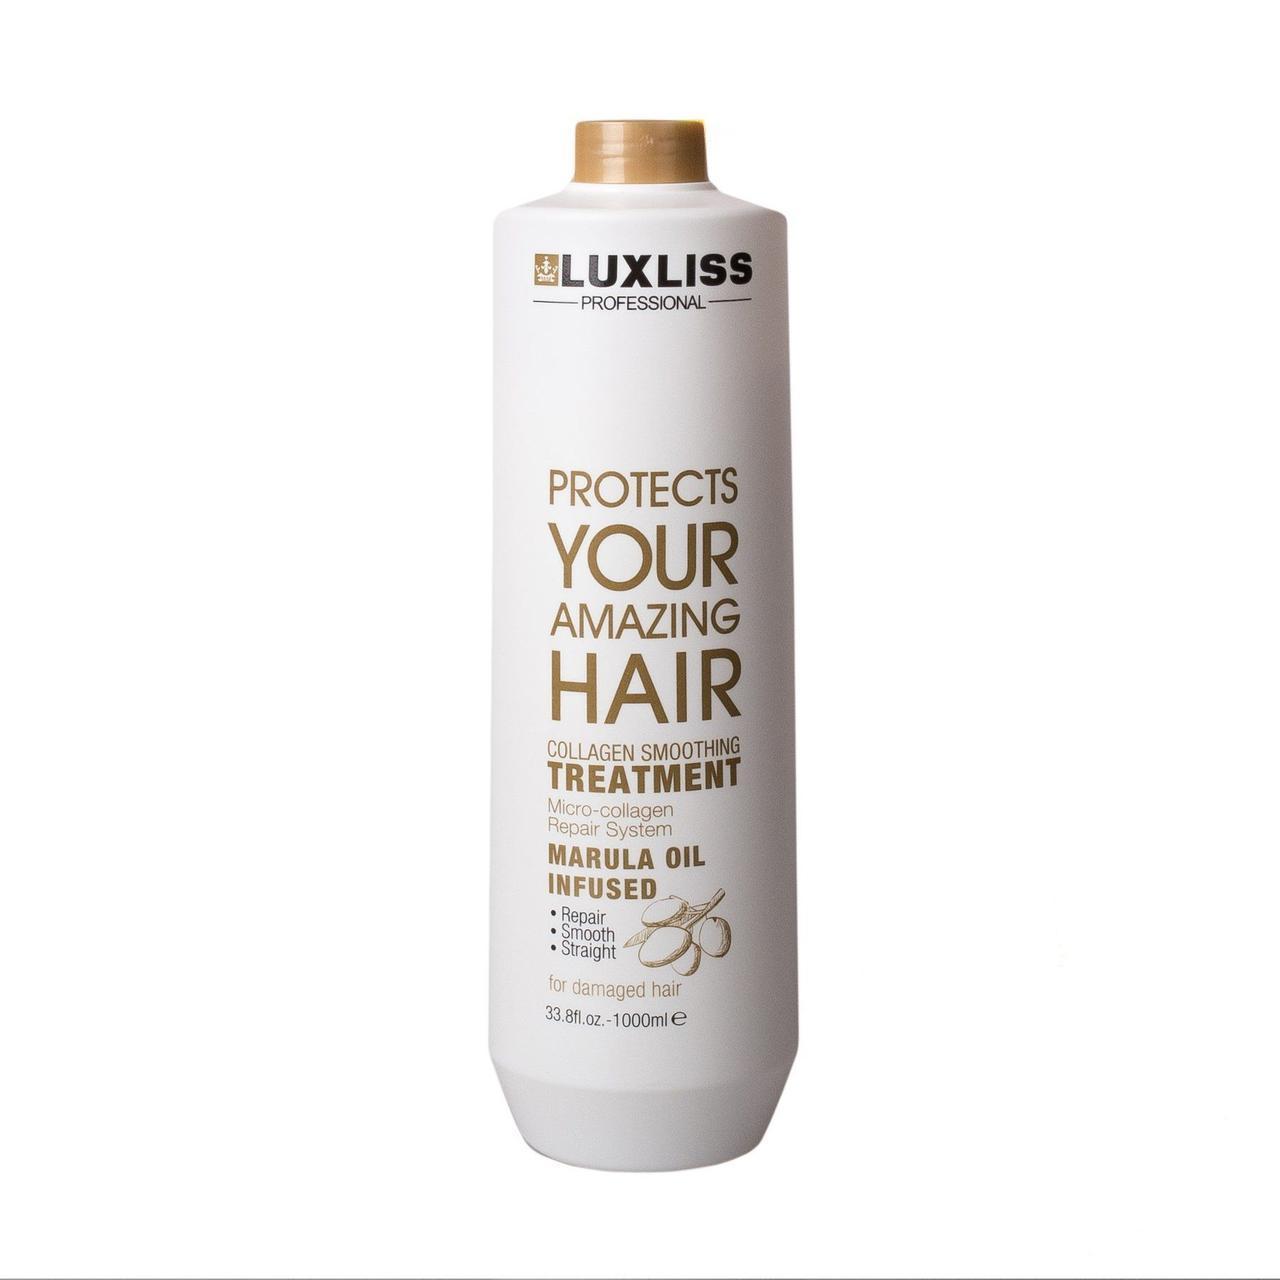 Luxliss Collagen Smoothing Repair System Кератин для випрямлення волосся, 1000 мл